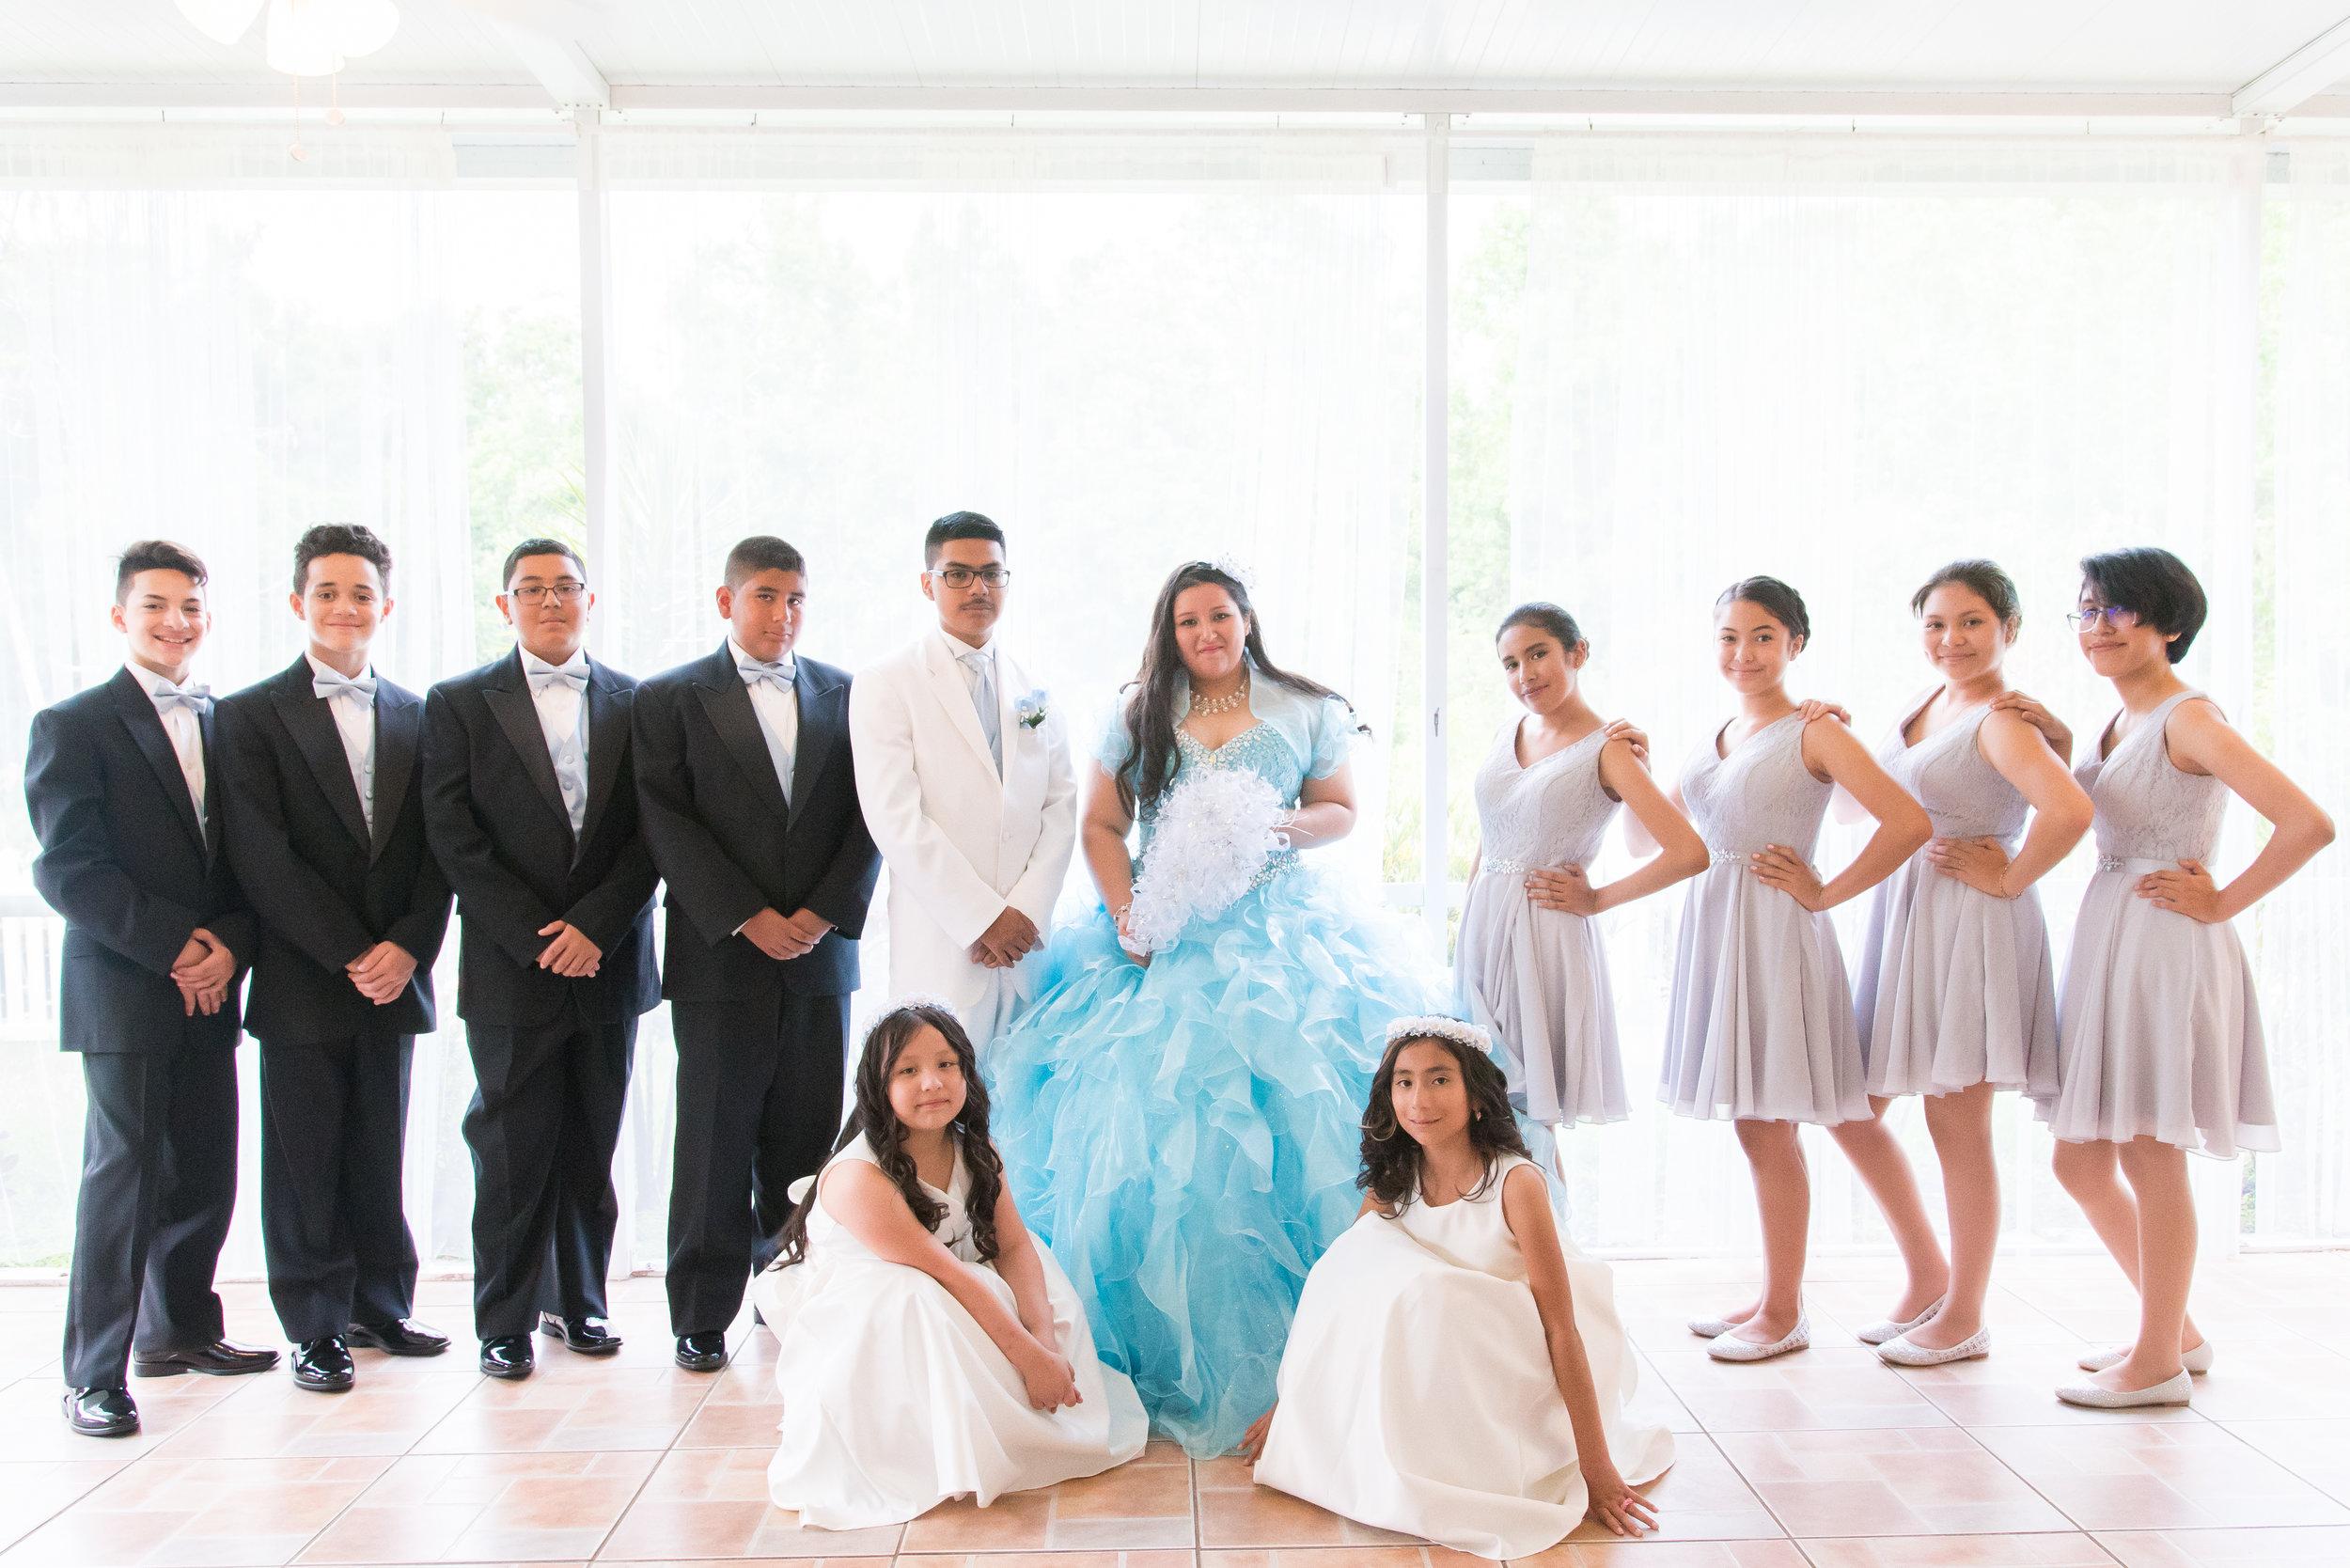 quinceanera-court-photographer-florida